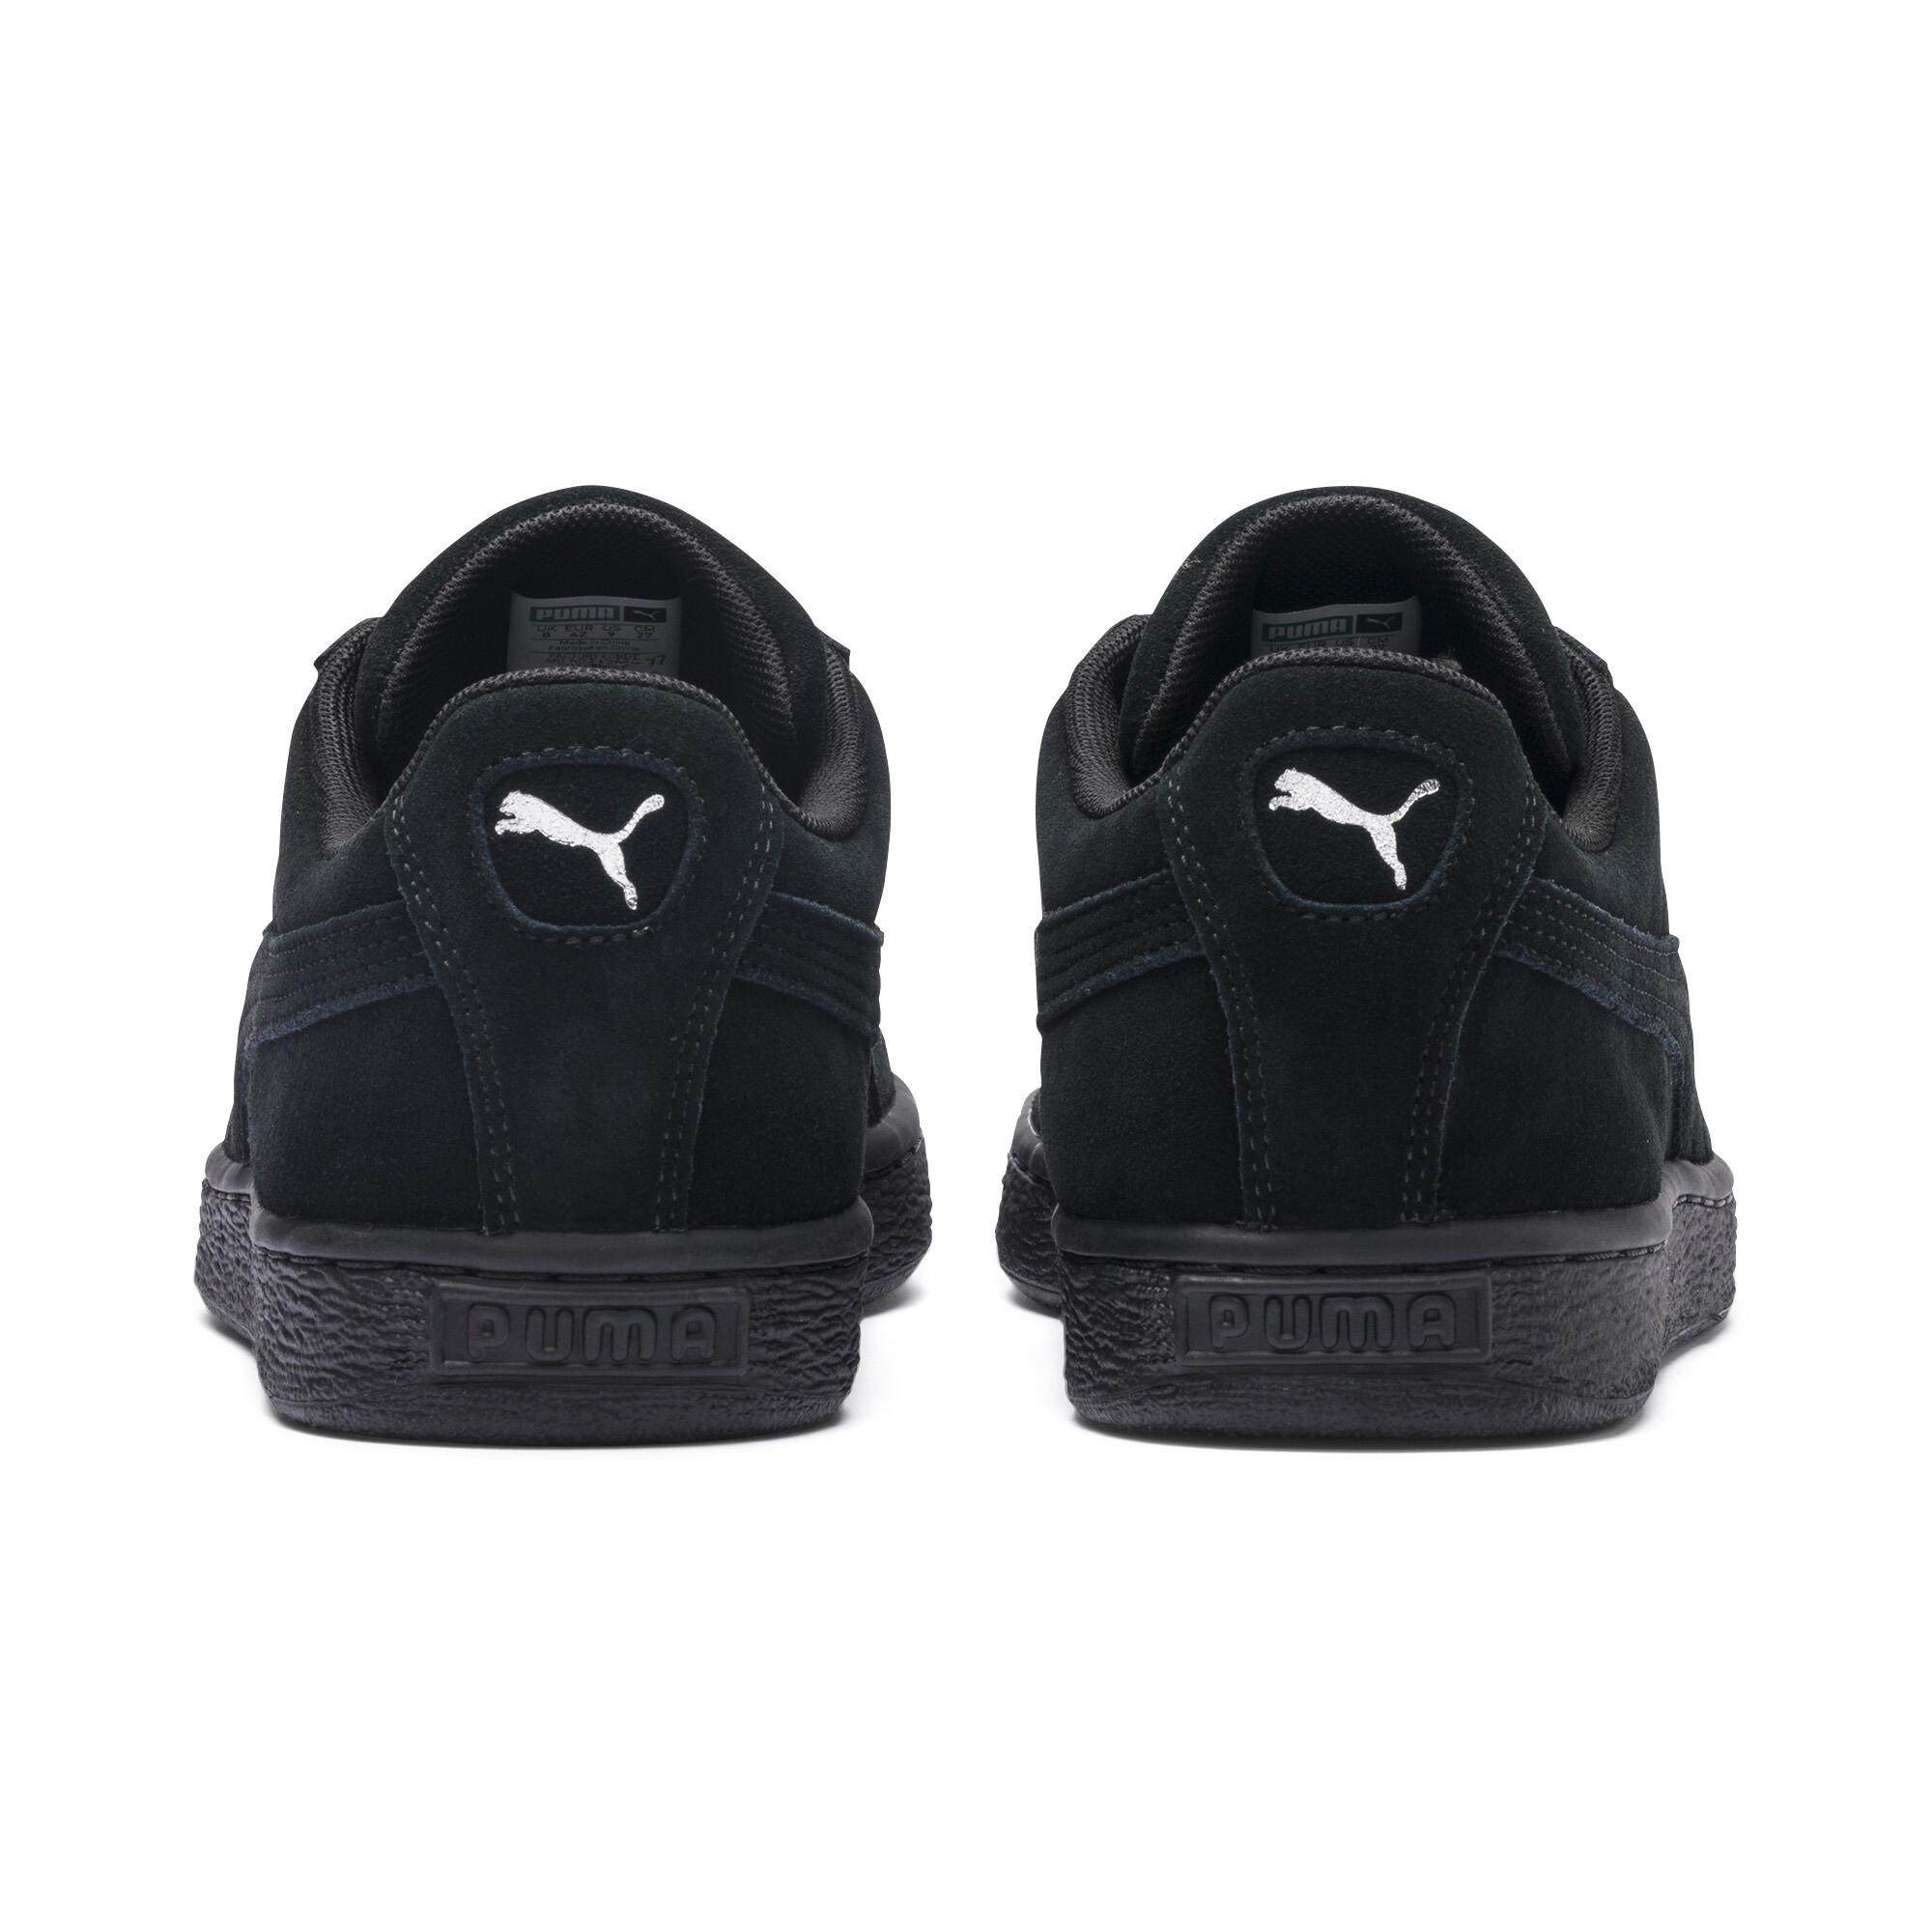 PUMA-Suede-Classic-Sneakers-Men-Shoe-Sport-Shoe thumbnail 3